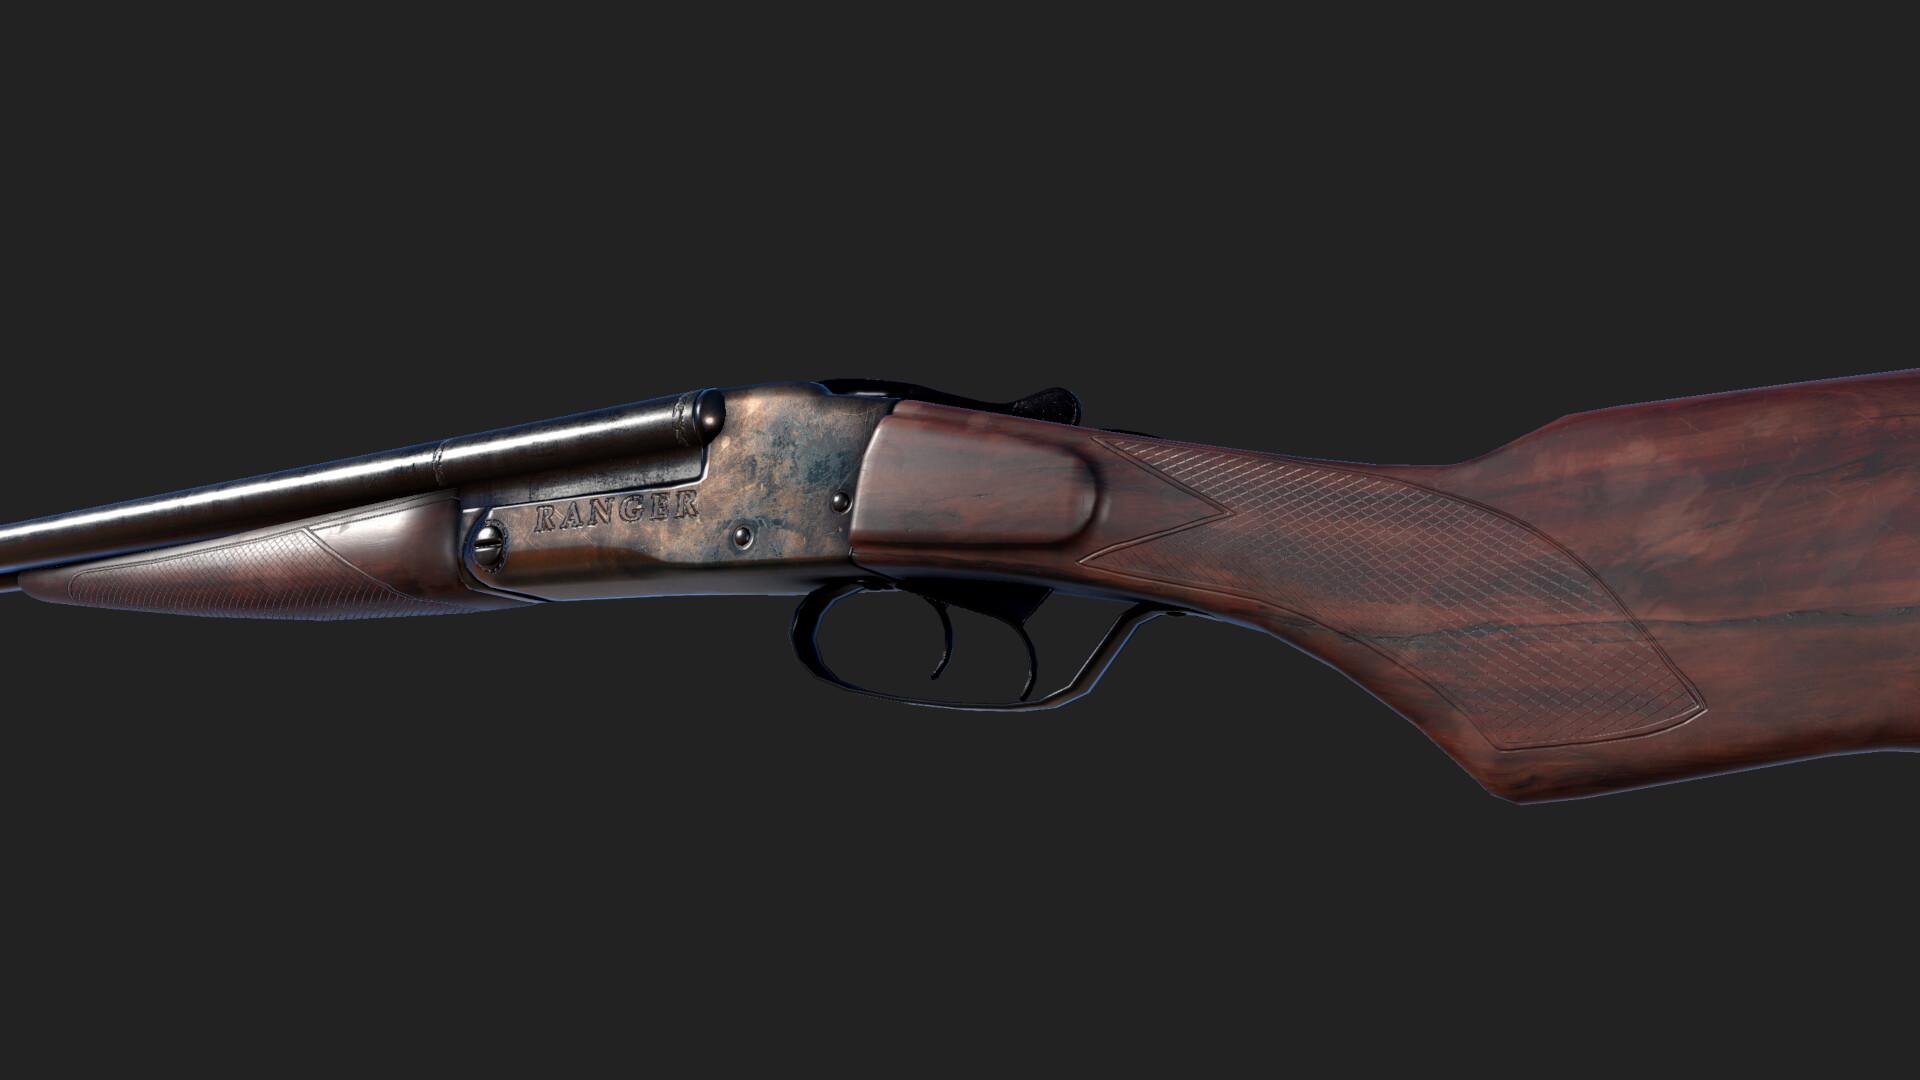 Jordan cameron ranger shotgun 3